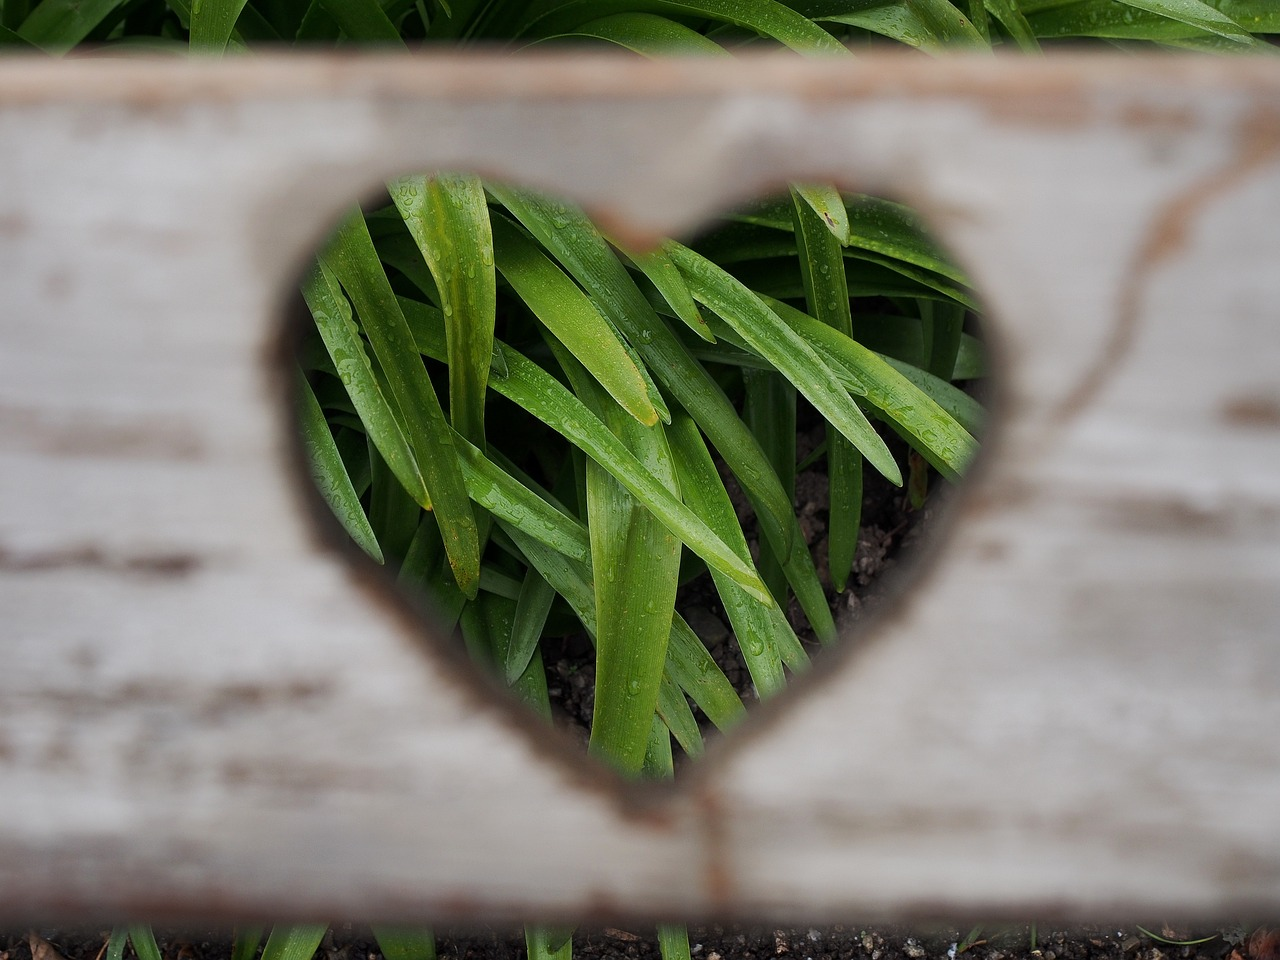 valentines-day-image-2